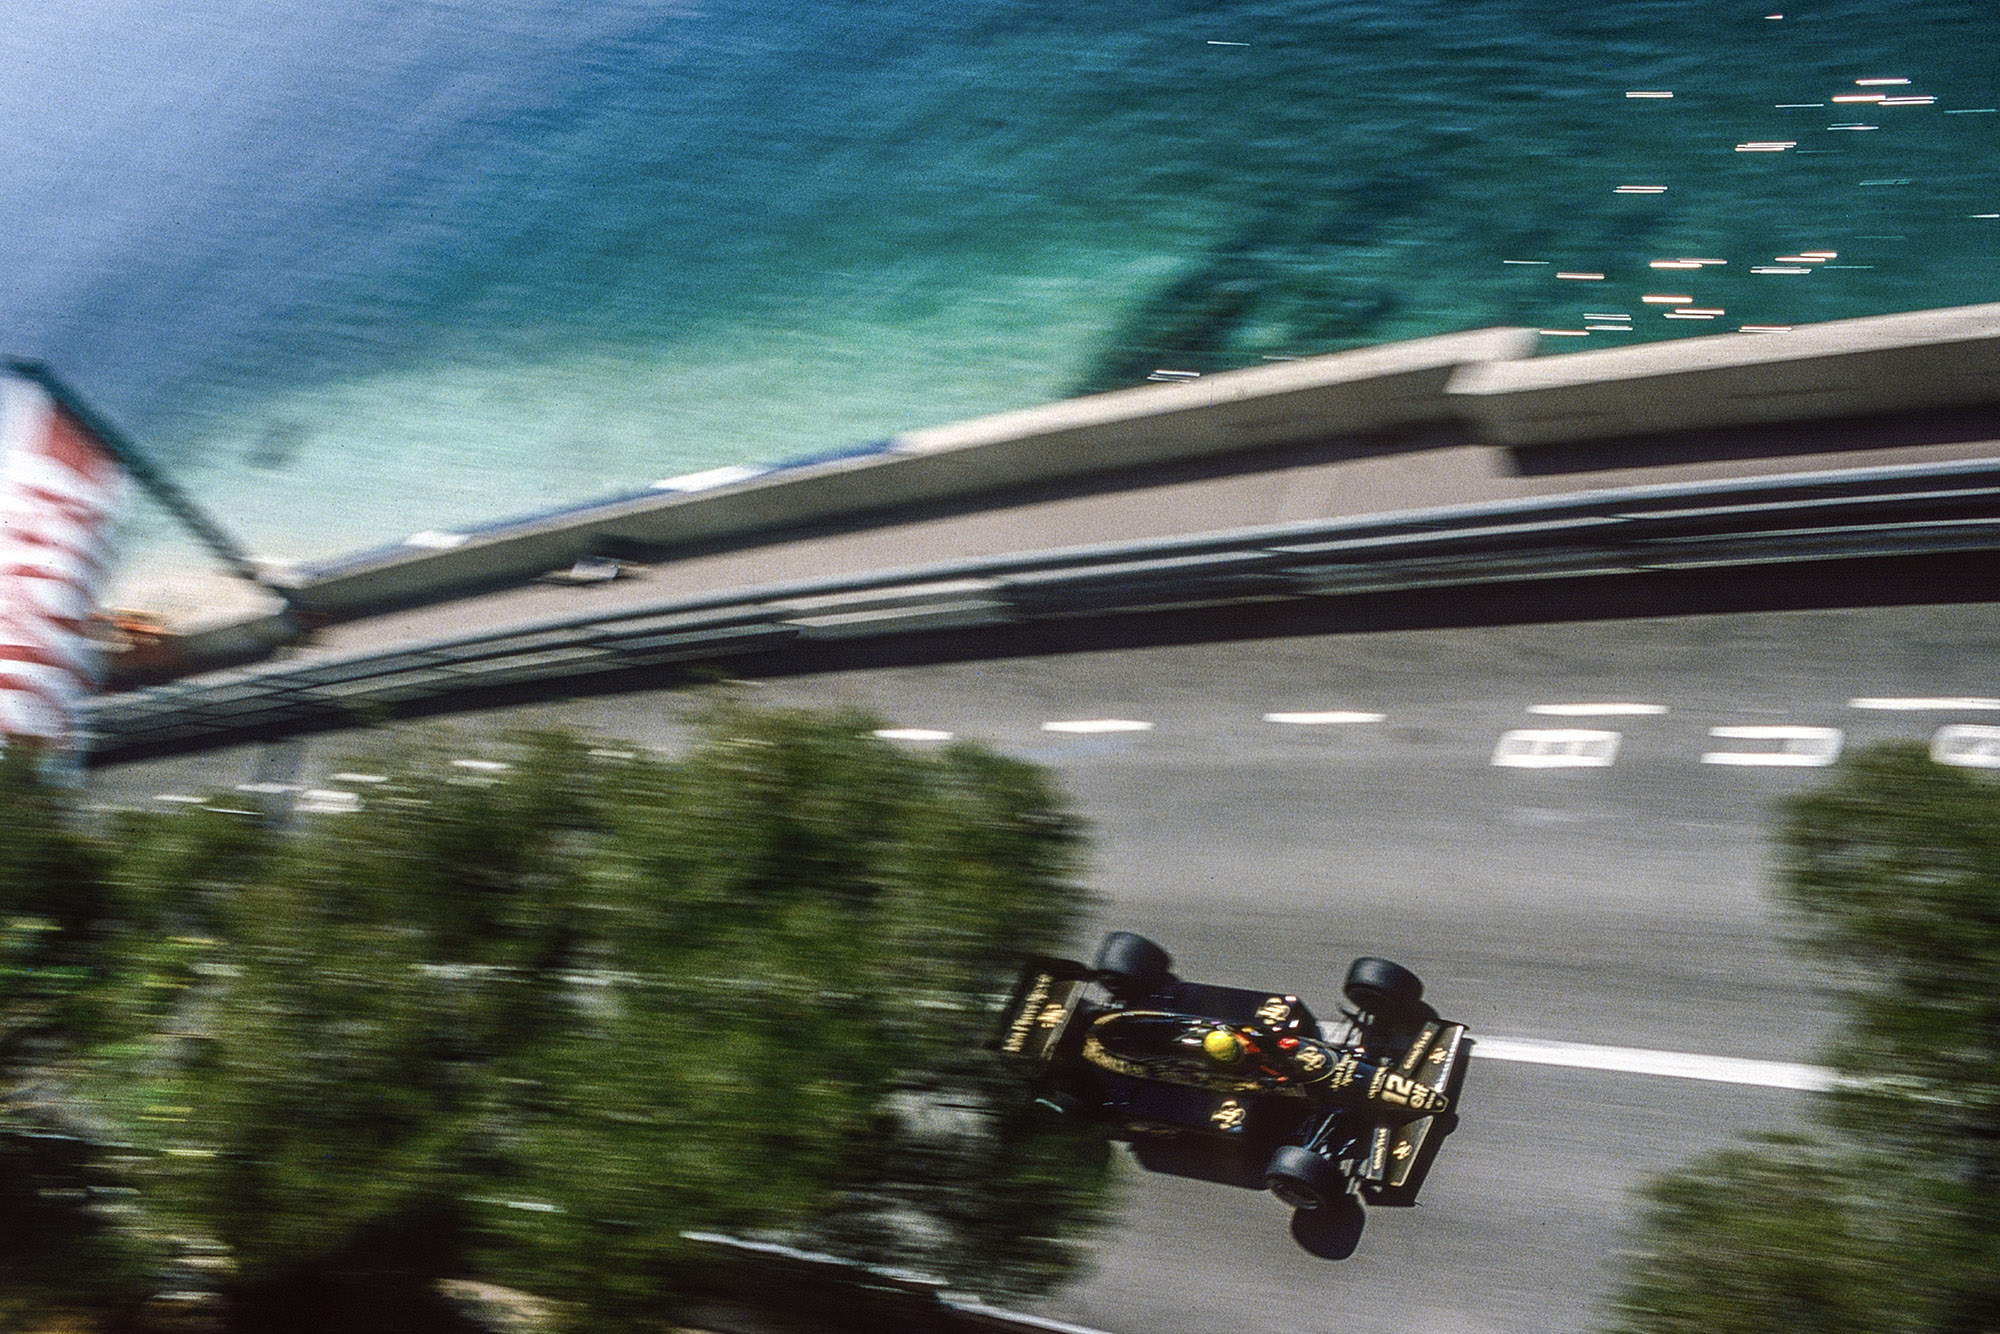 9. Ayrton Senna on the seafront during the 1985 Monaco Grand Prix